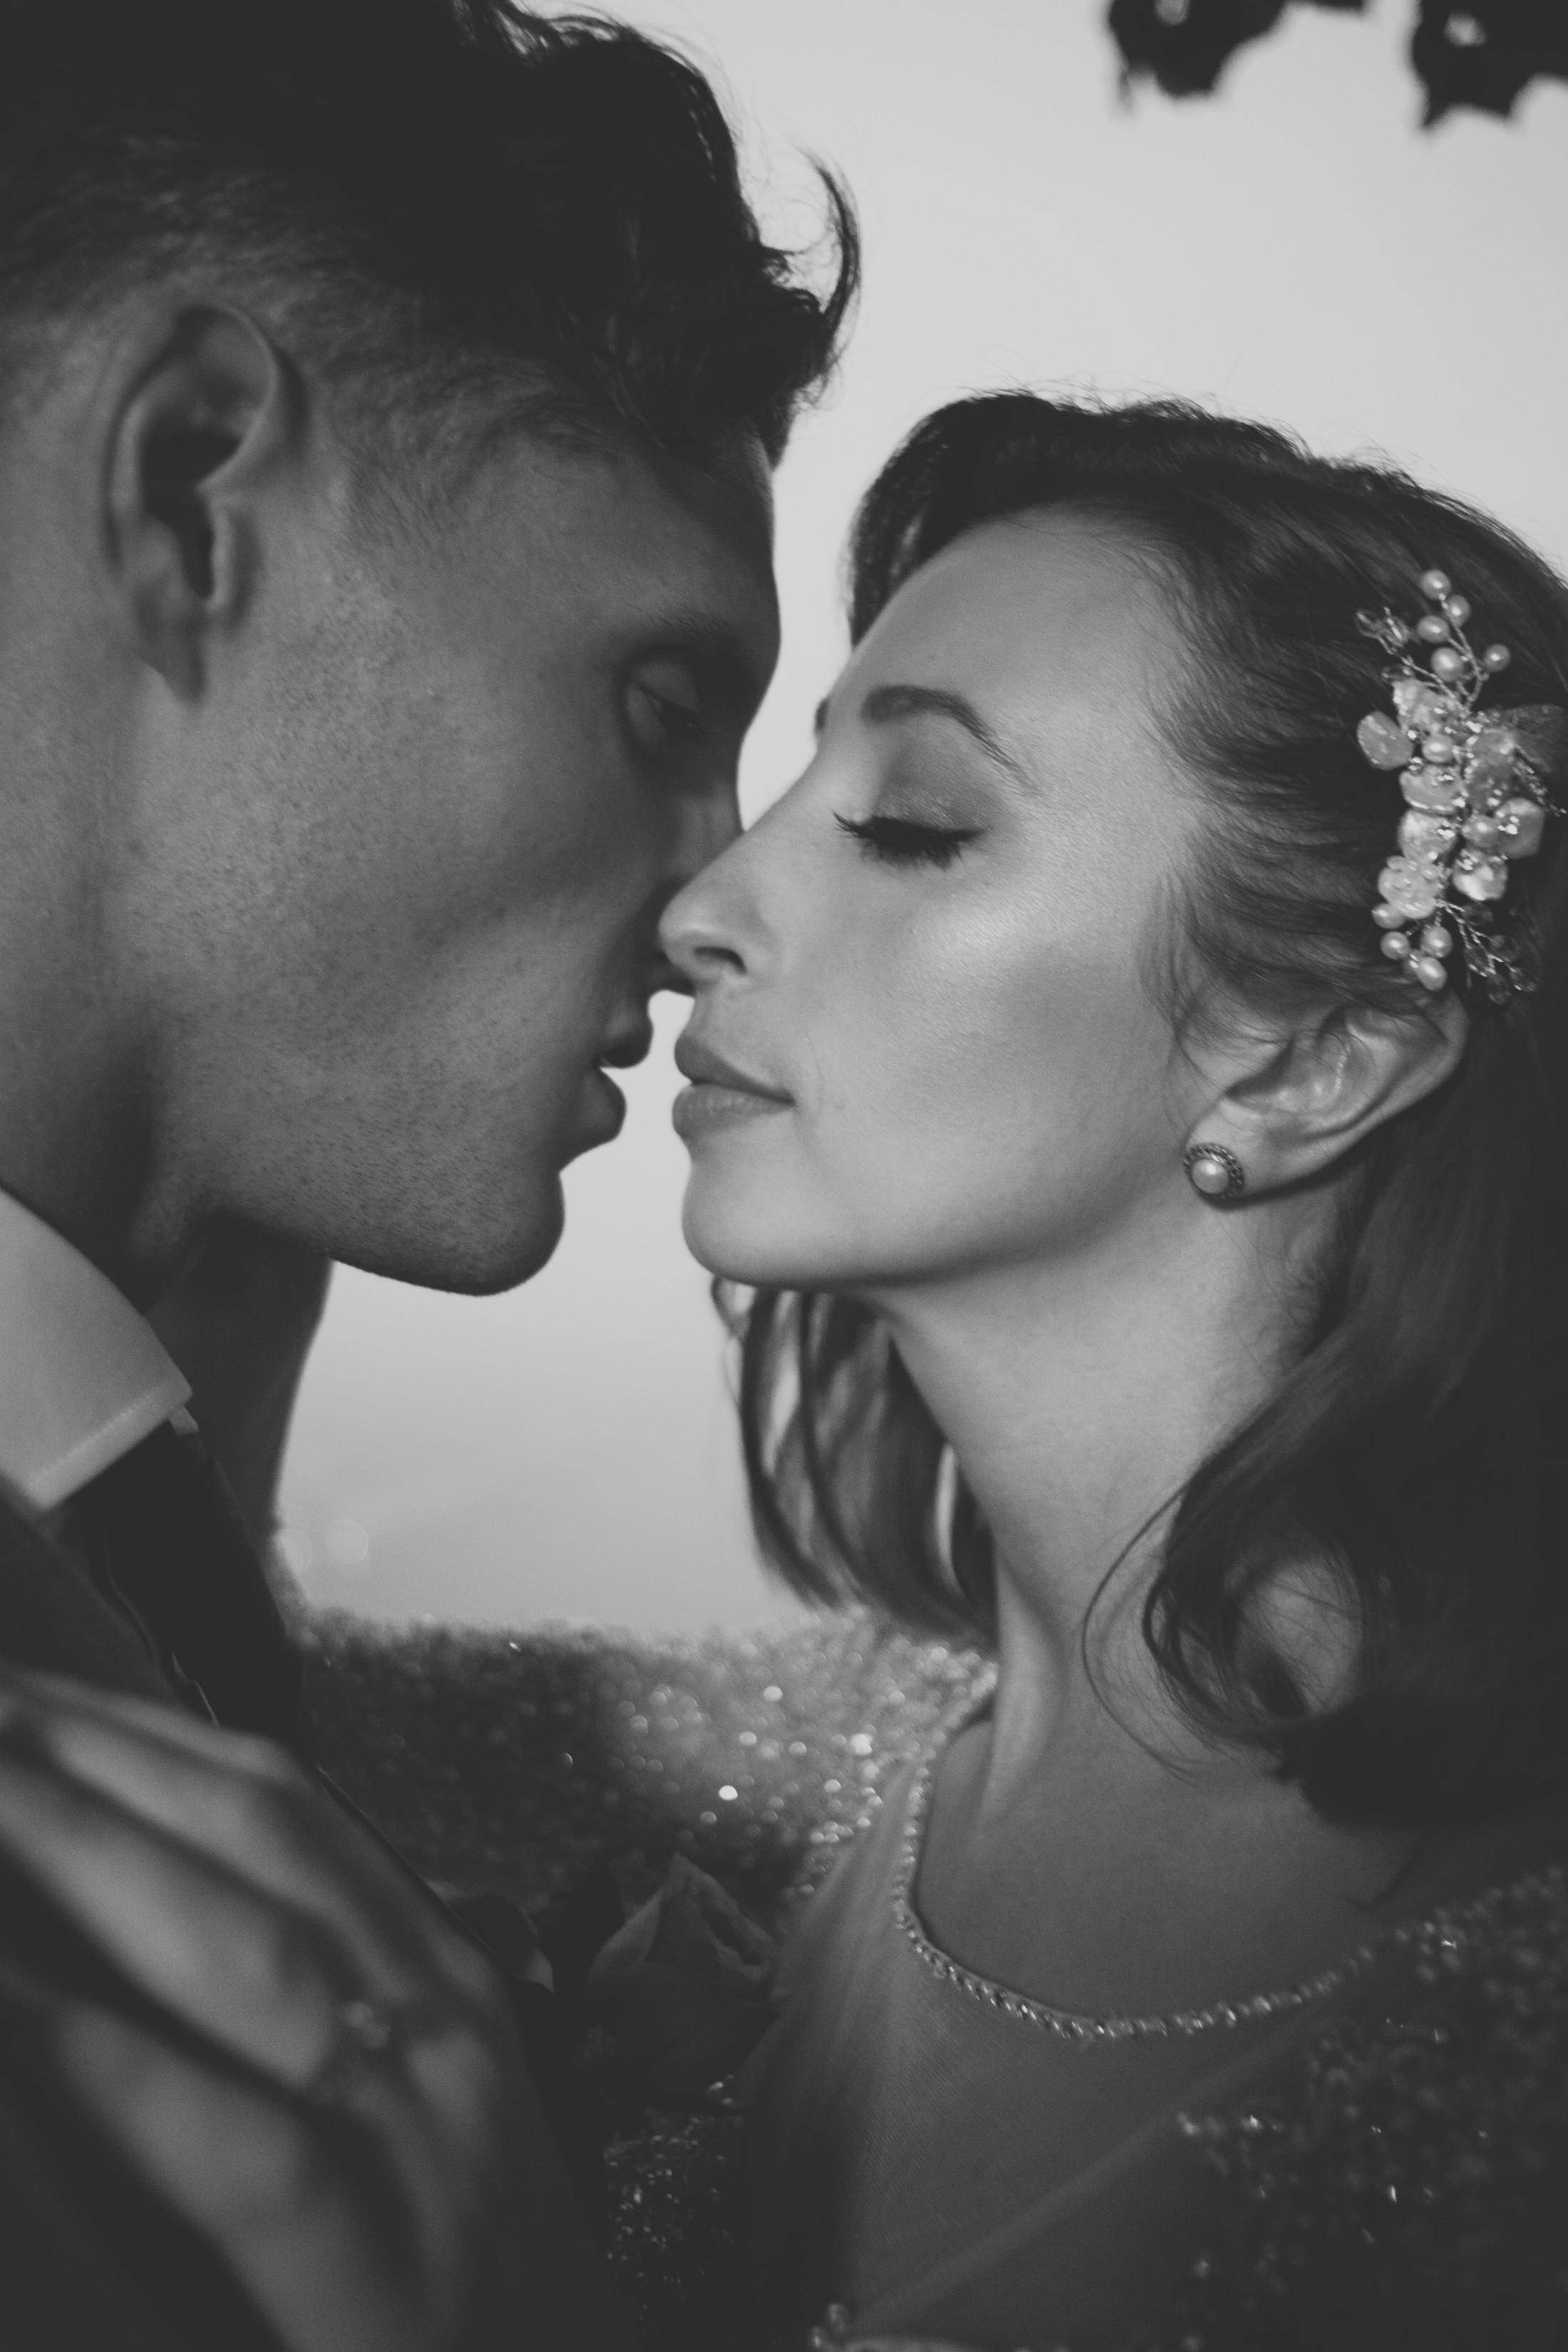 ravello wedding bride and groom intimate portrait